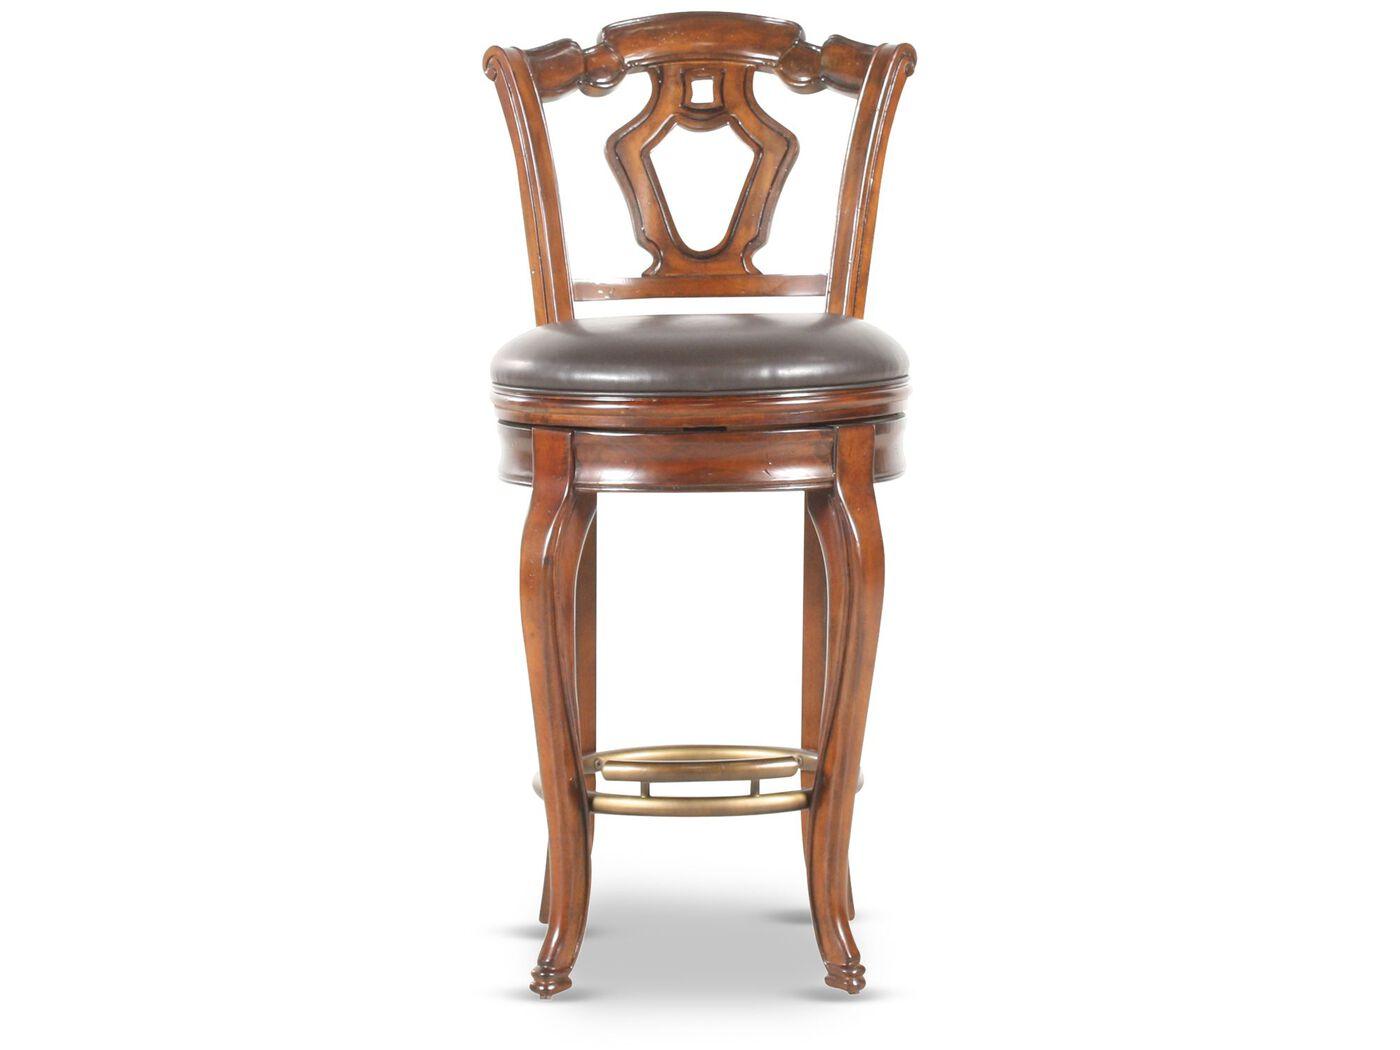 Pulaski Toscano Bar Stool Mathis Brothers Furniture : PUL 657501 from www.mathisbrothers.com size 1333 x 1000 jpeg 57kB